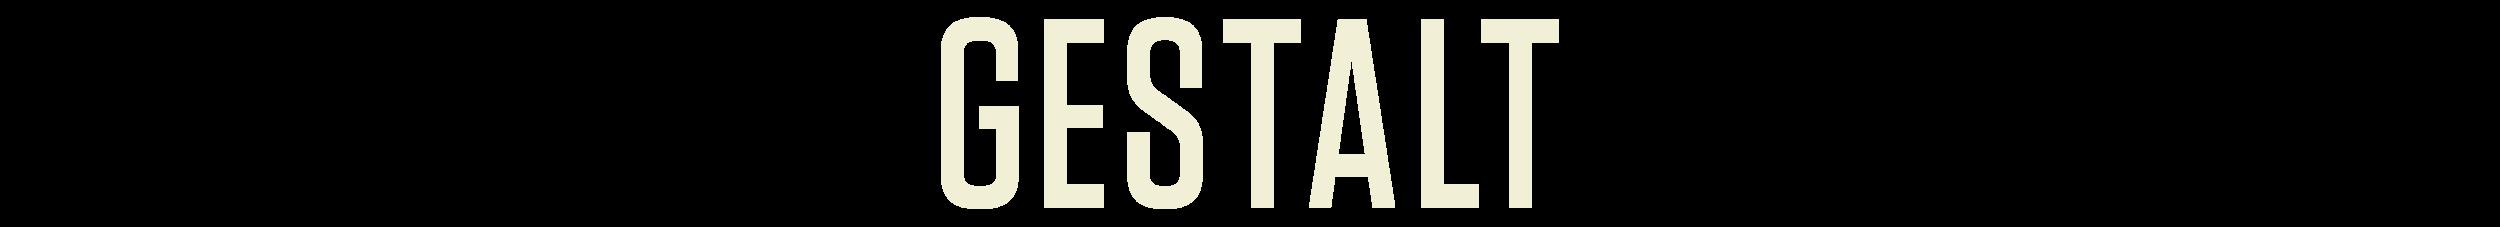 Gestalt Logos cream3-01.png